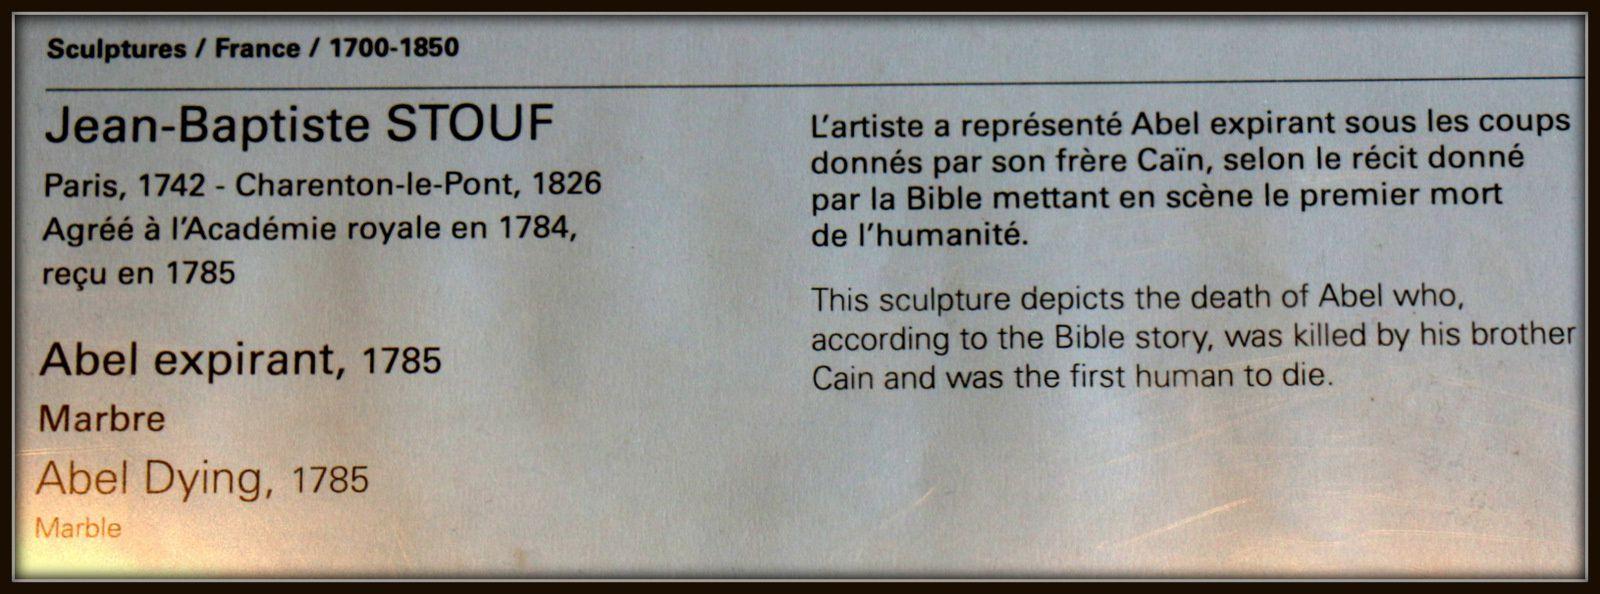 Jean-Baptiste Stouf, Abel expirant